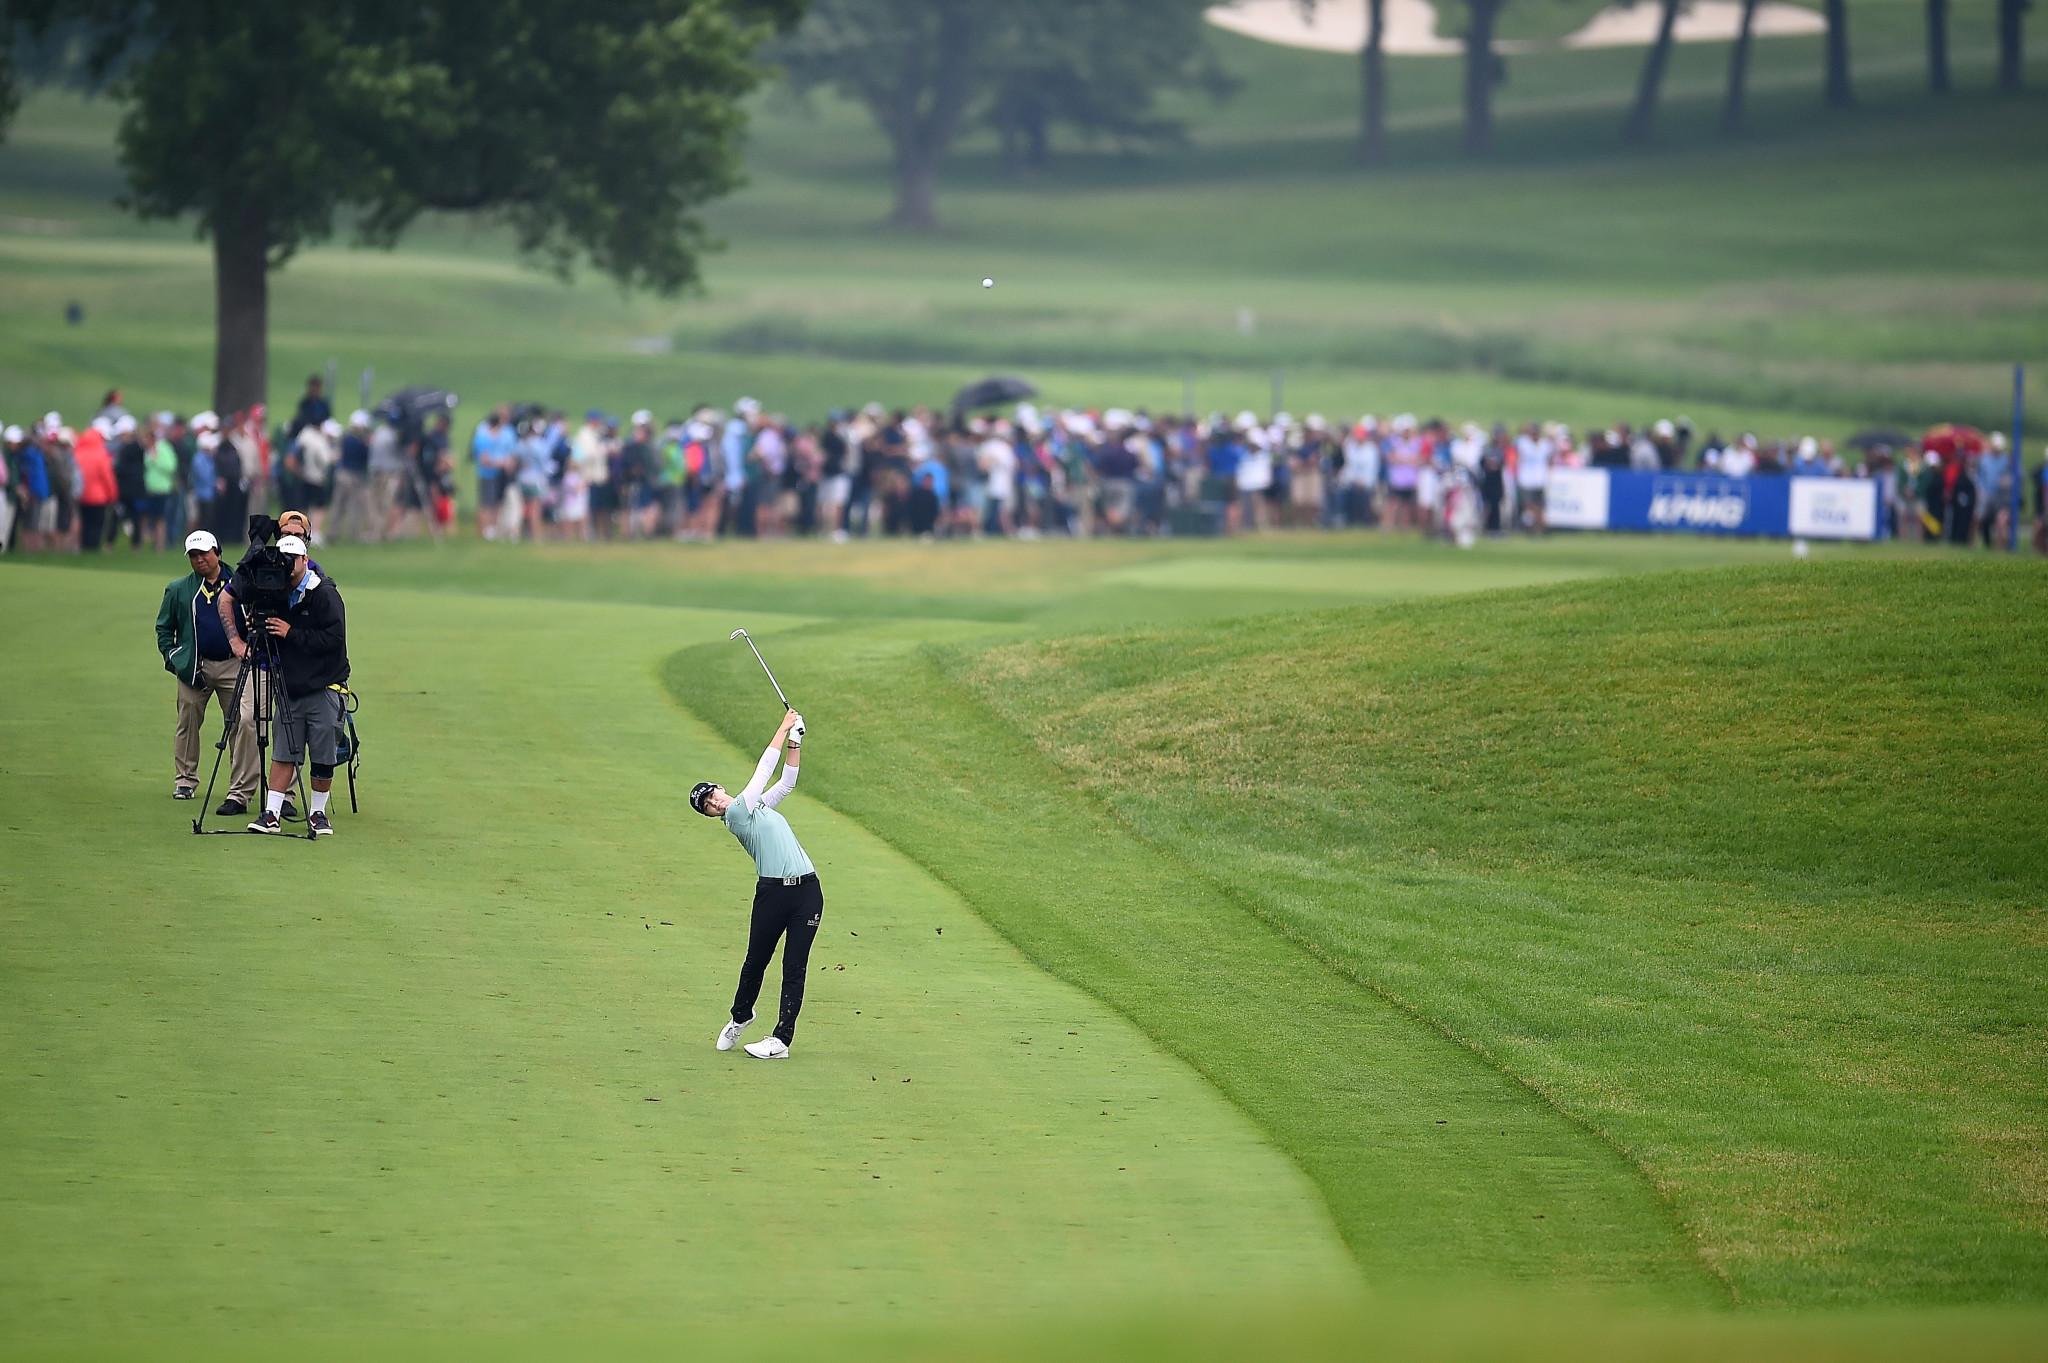 Women's PGA Championship rescheduled for October